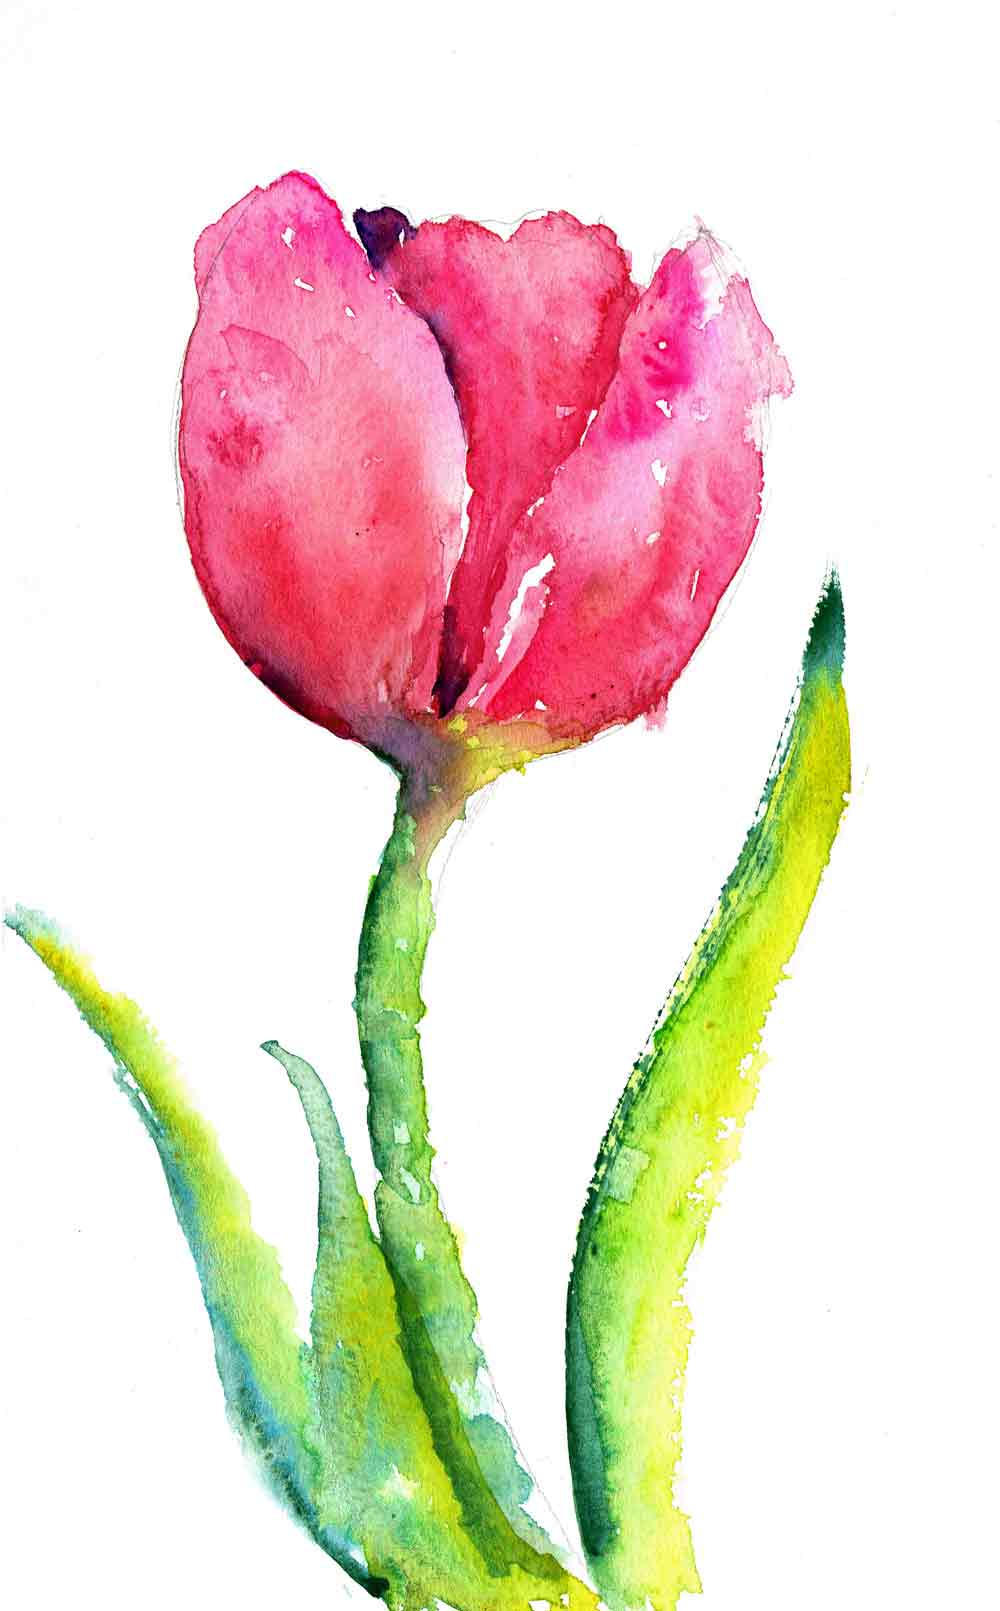 Tulips-no-7-single-purple-kw.jpg